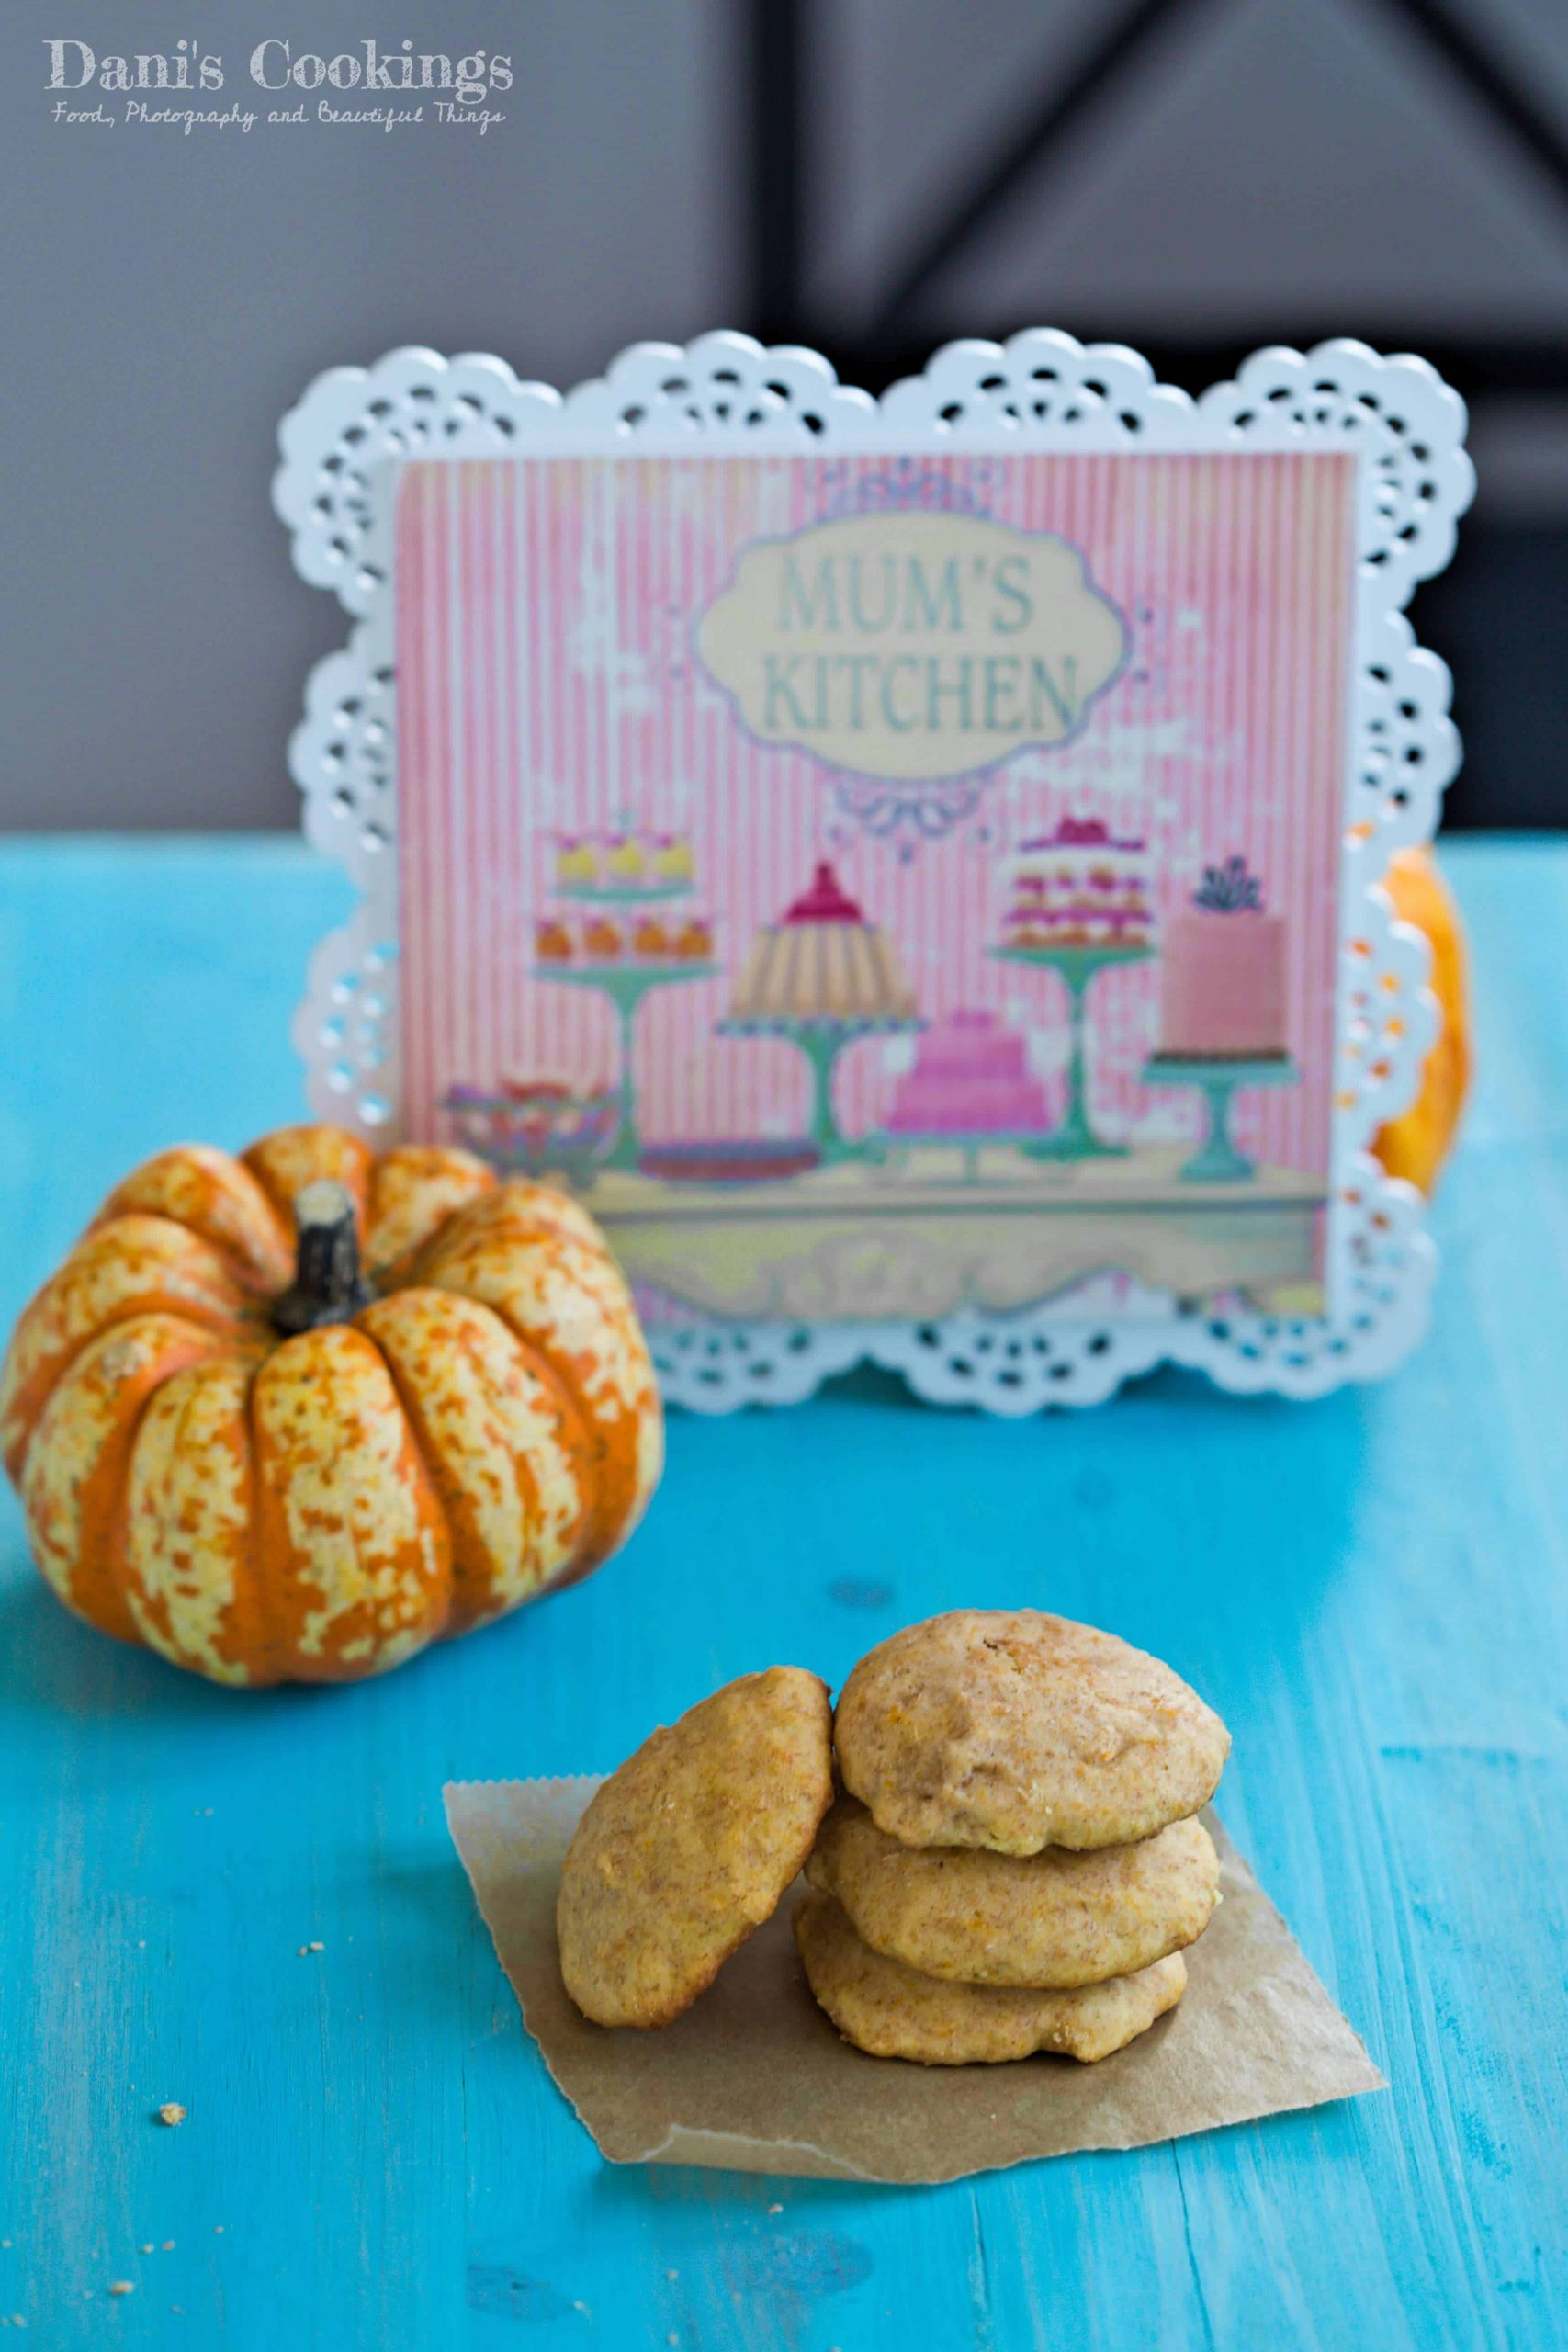 pumpkin cookies with a pumpkin behinds with cinnamon | Dani's Cookings